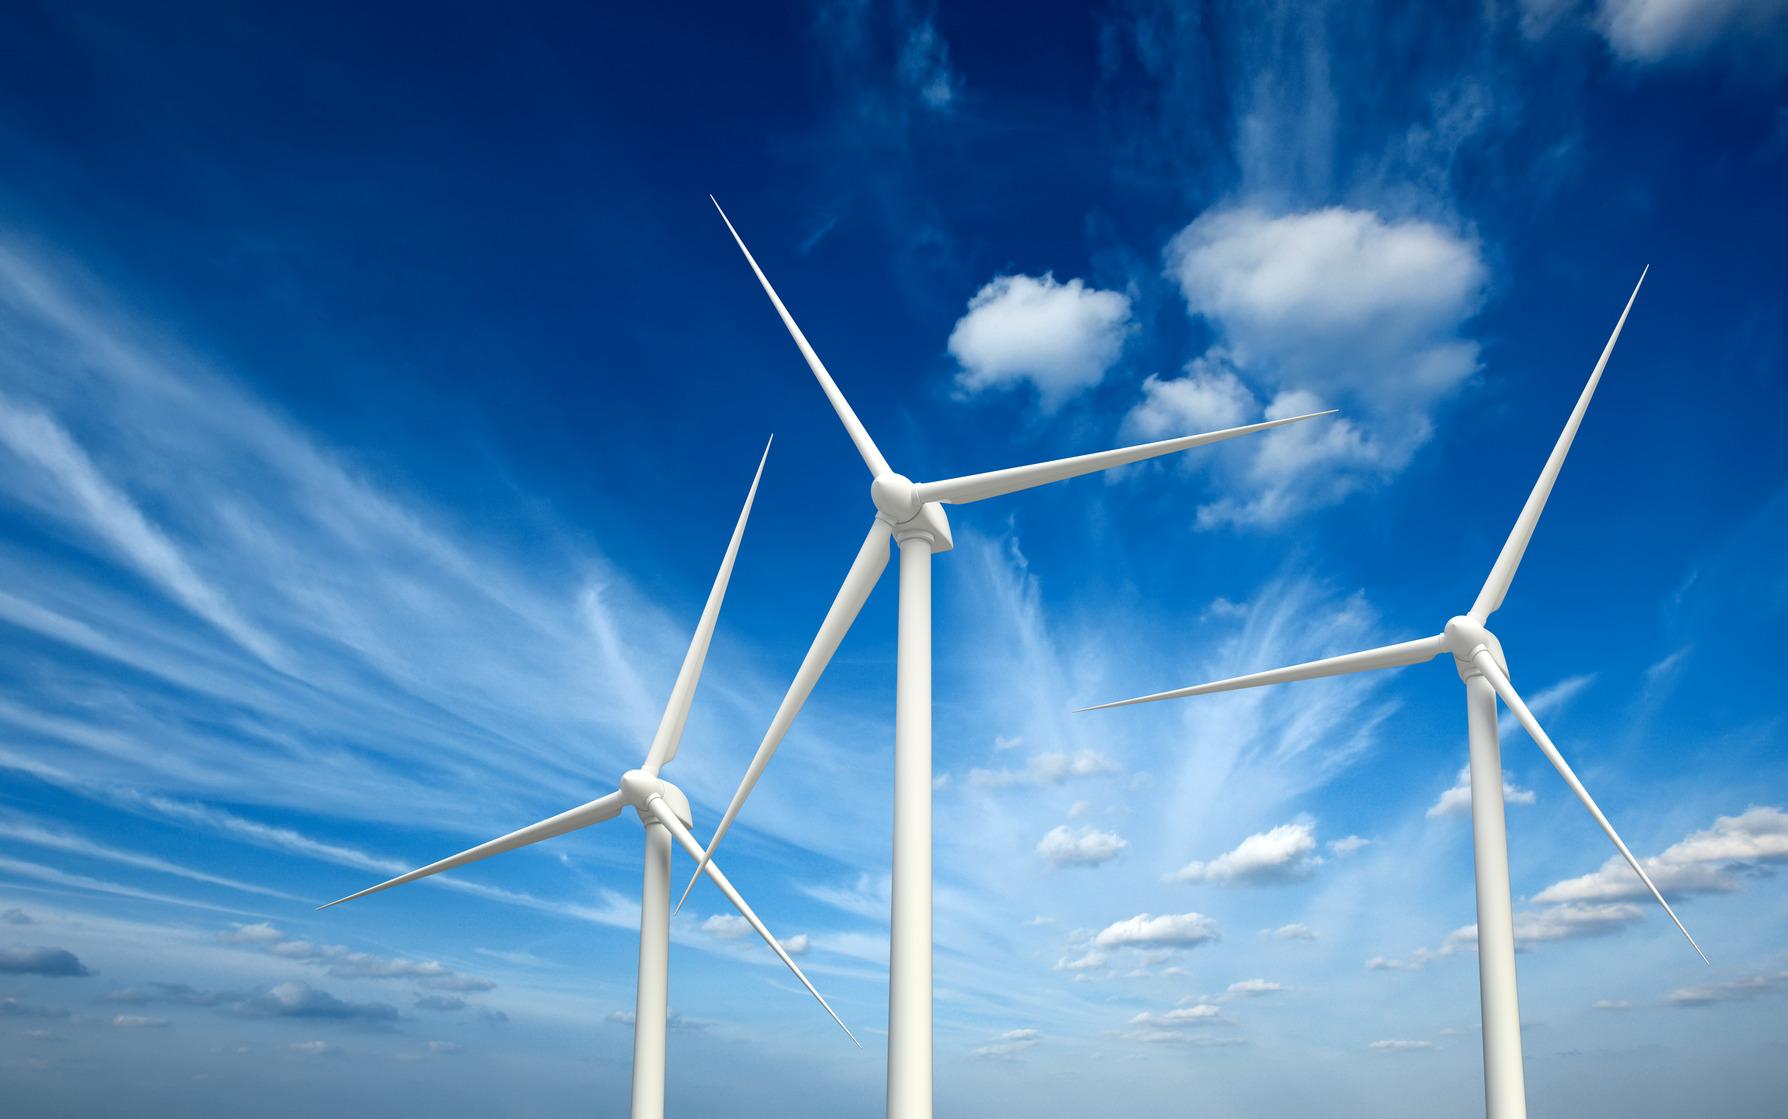 Bladeless Wind Turbine Built by Solar Aero, Inspired by Nikola